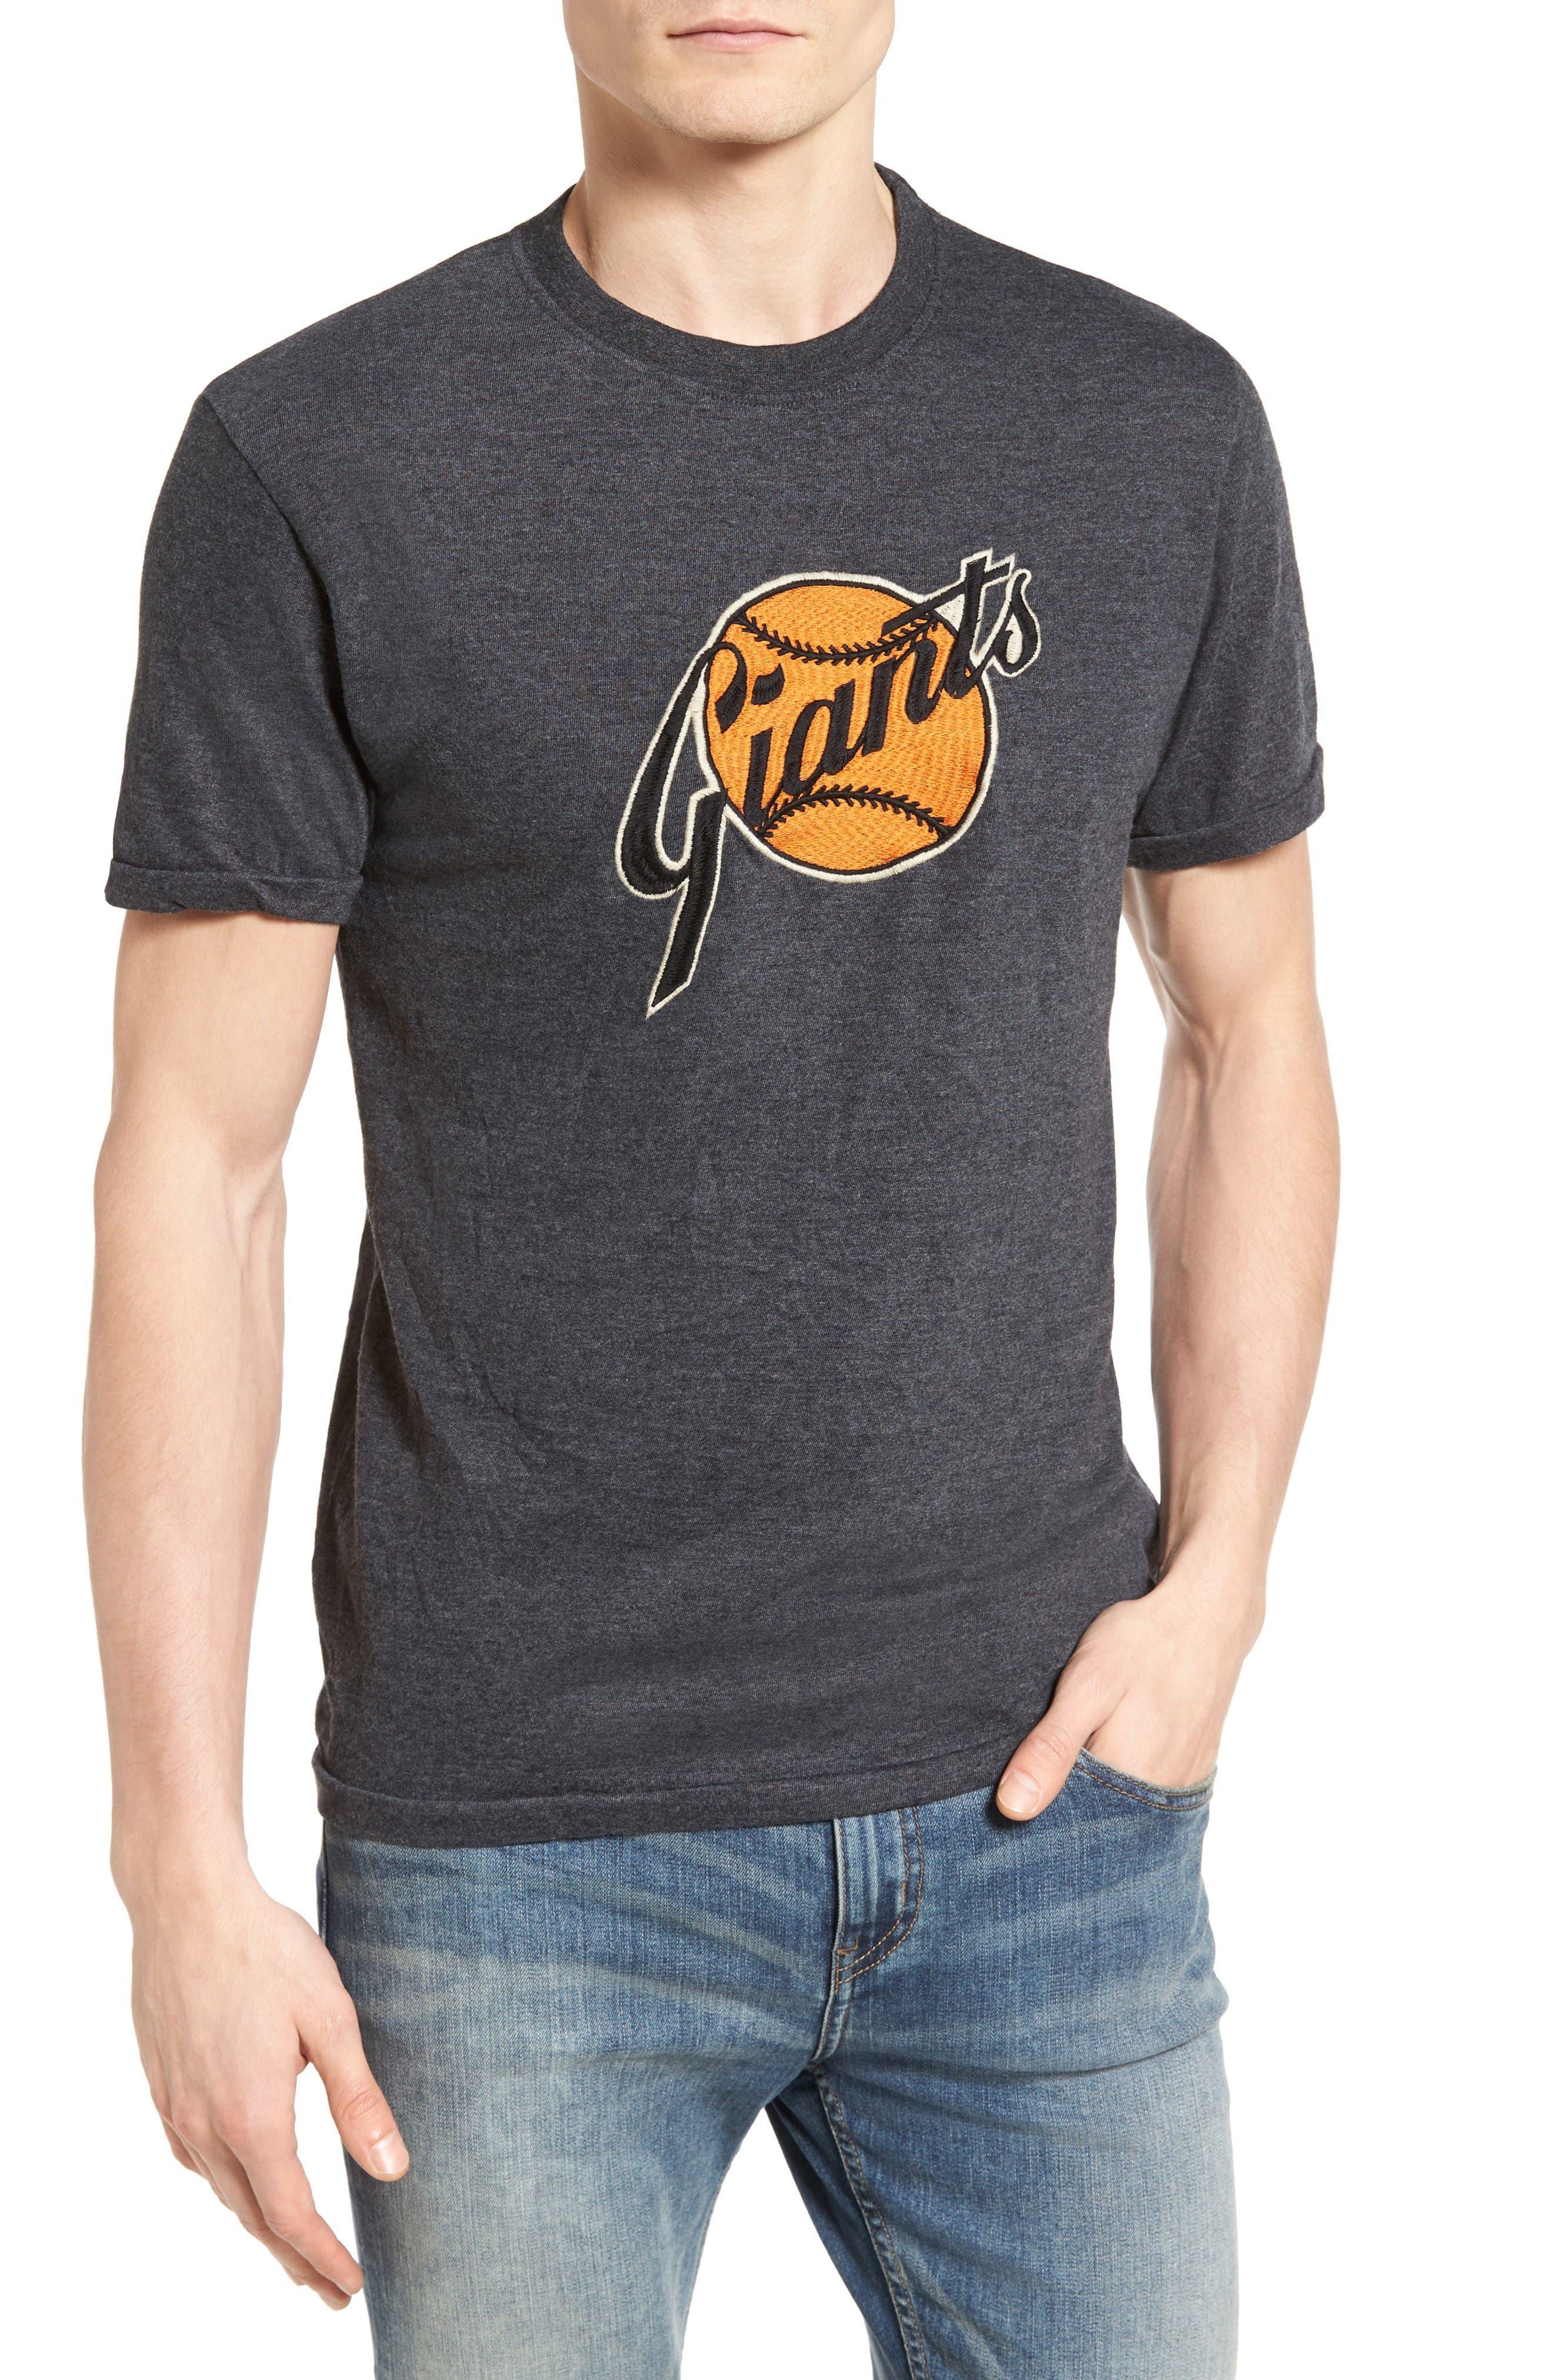 Main Image - American Needle Hillwood San Francisco Giants T-Shirt